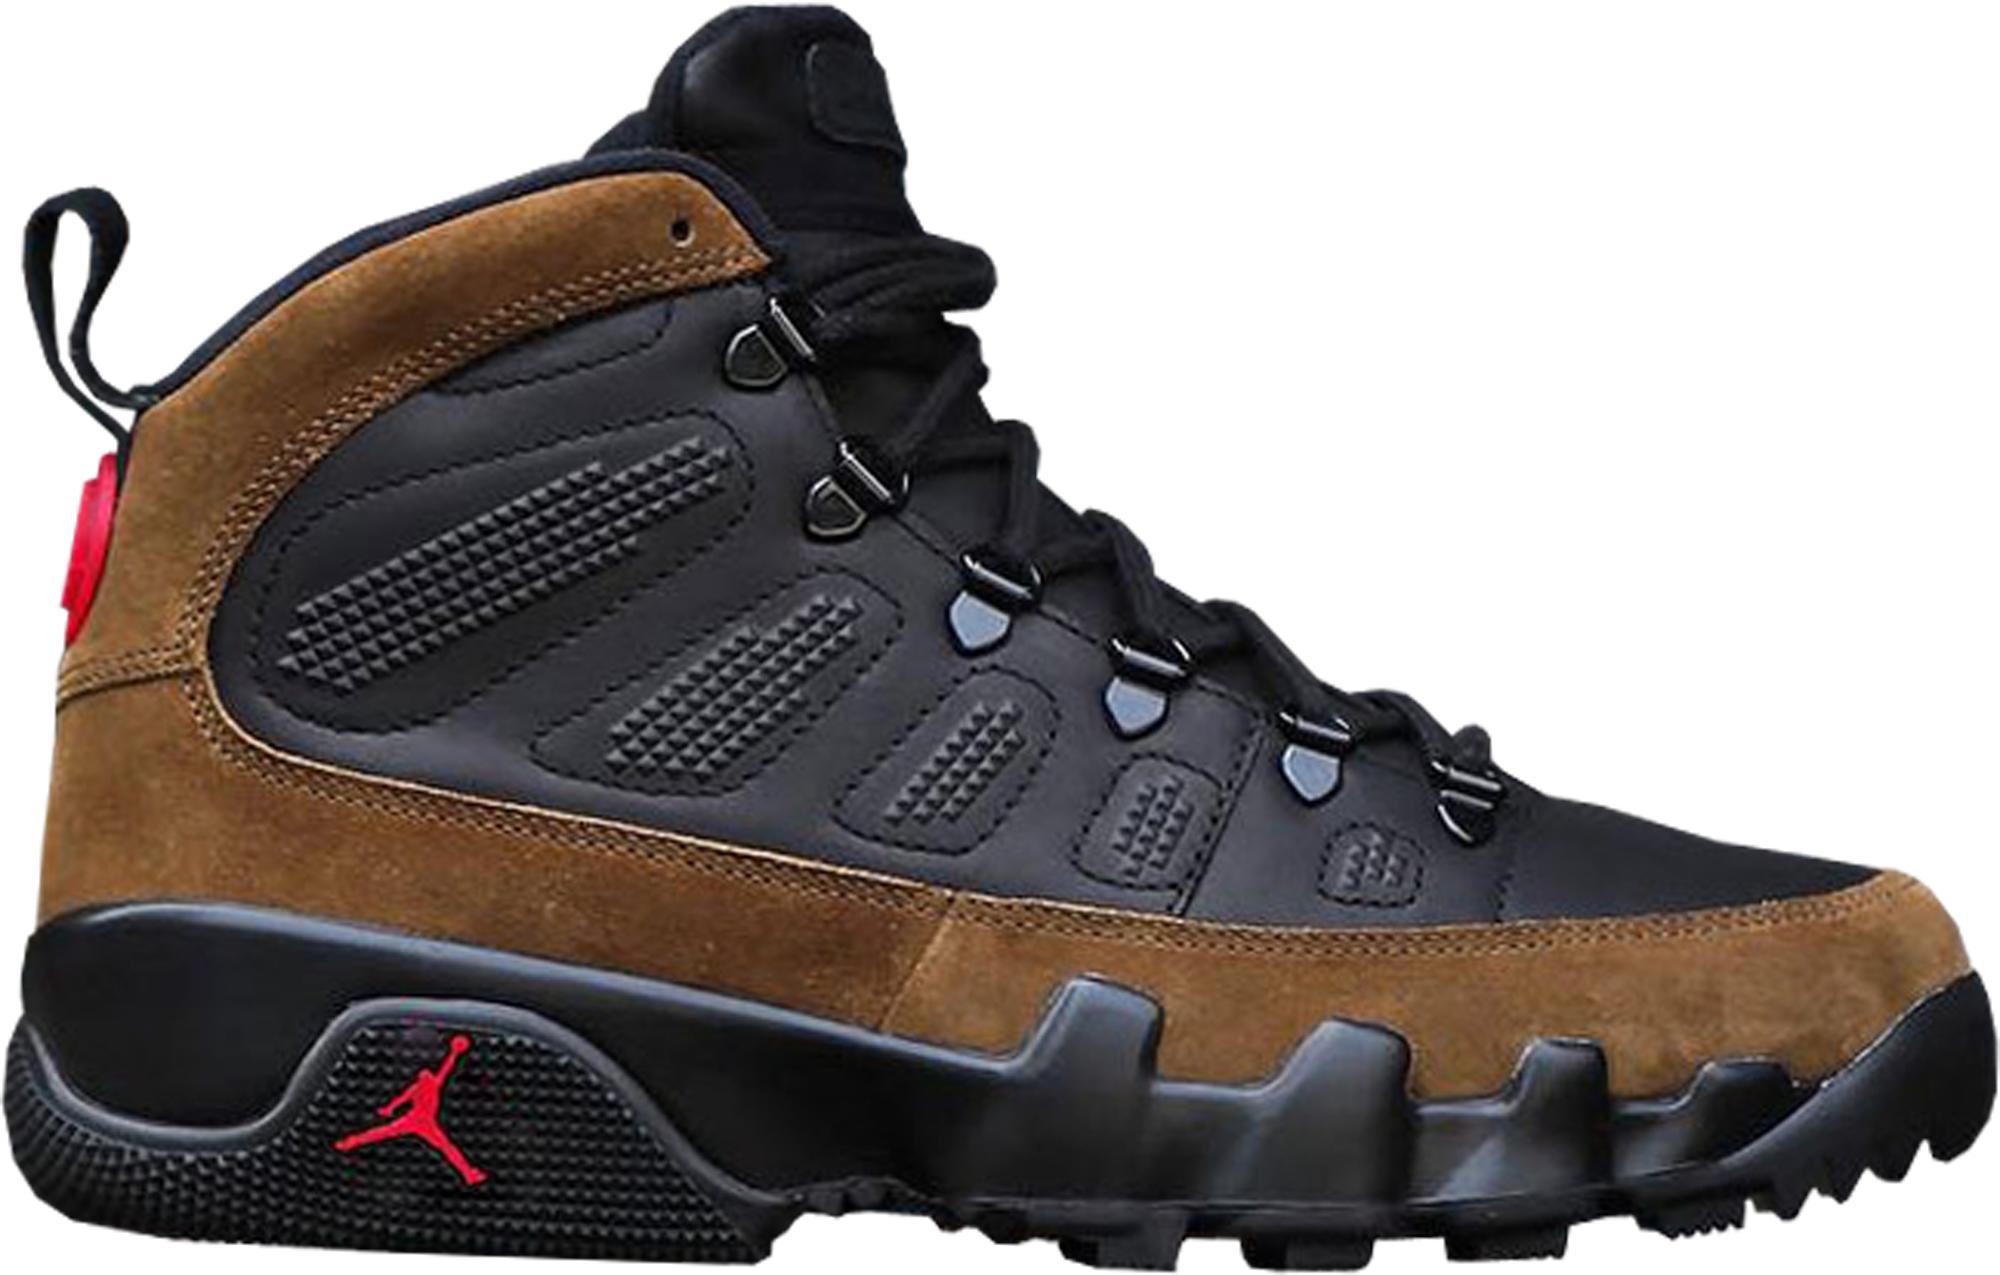 Jordan 9 Retro Boot NRG Olive